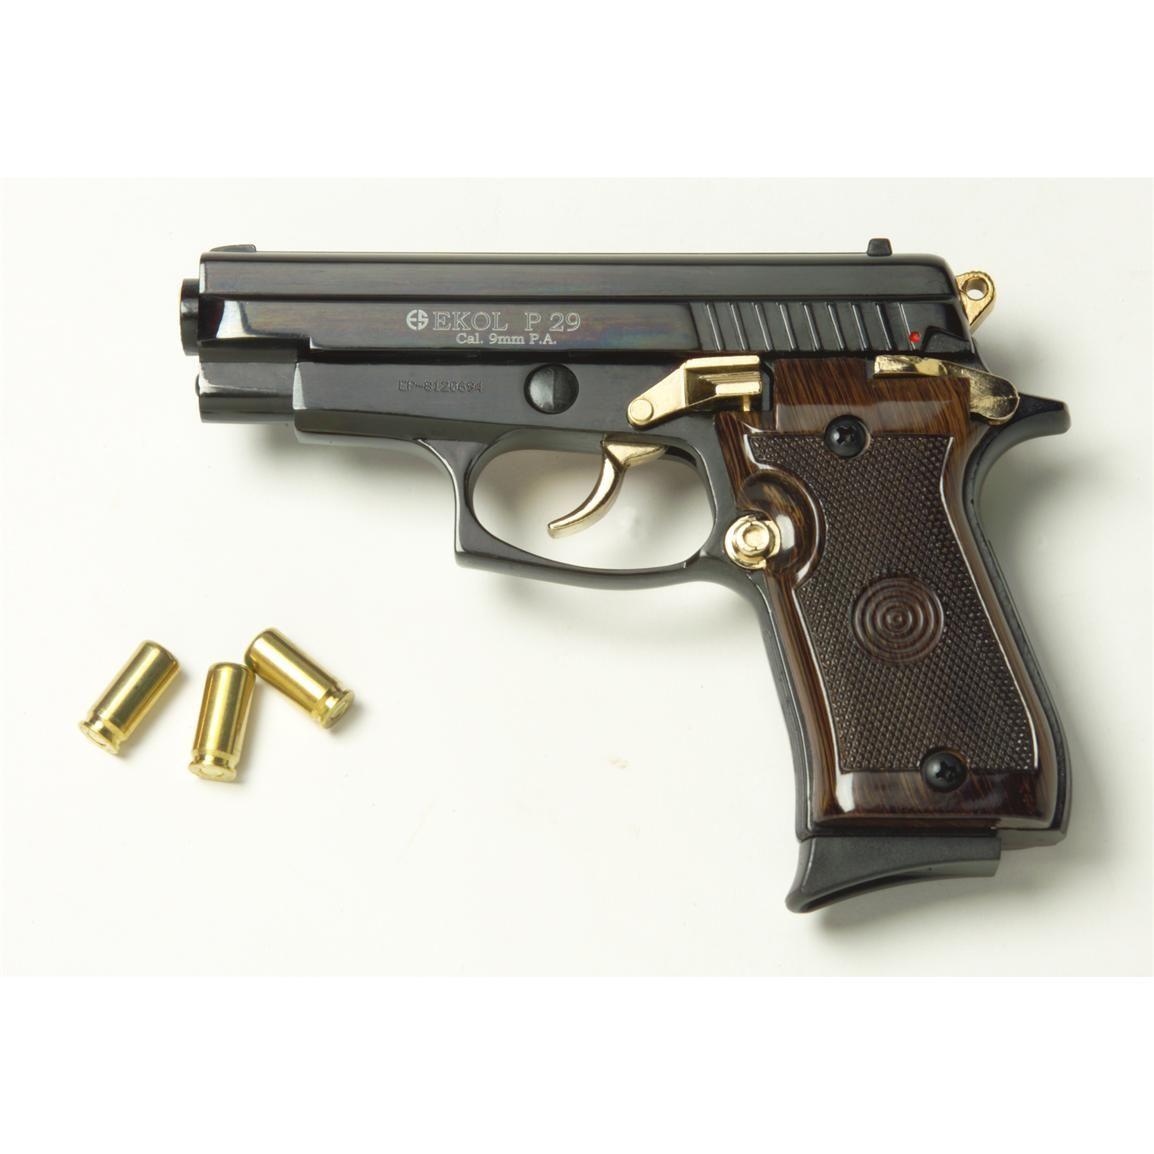 Blank Firing 9 Mm P29 Semi Automatic Pistol Black Gold Pistol